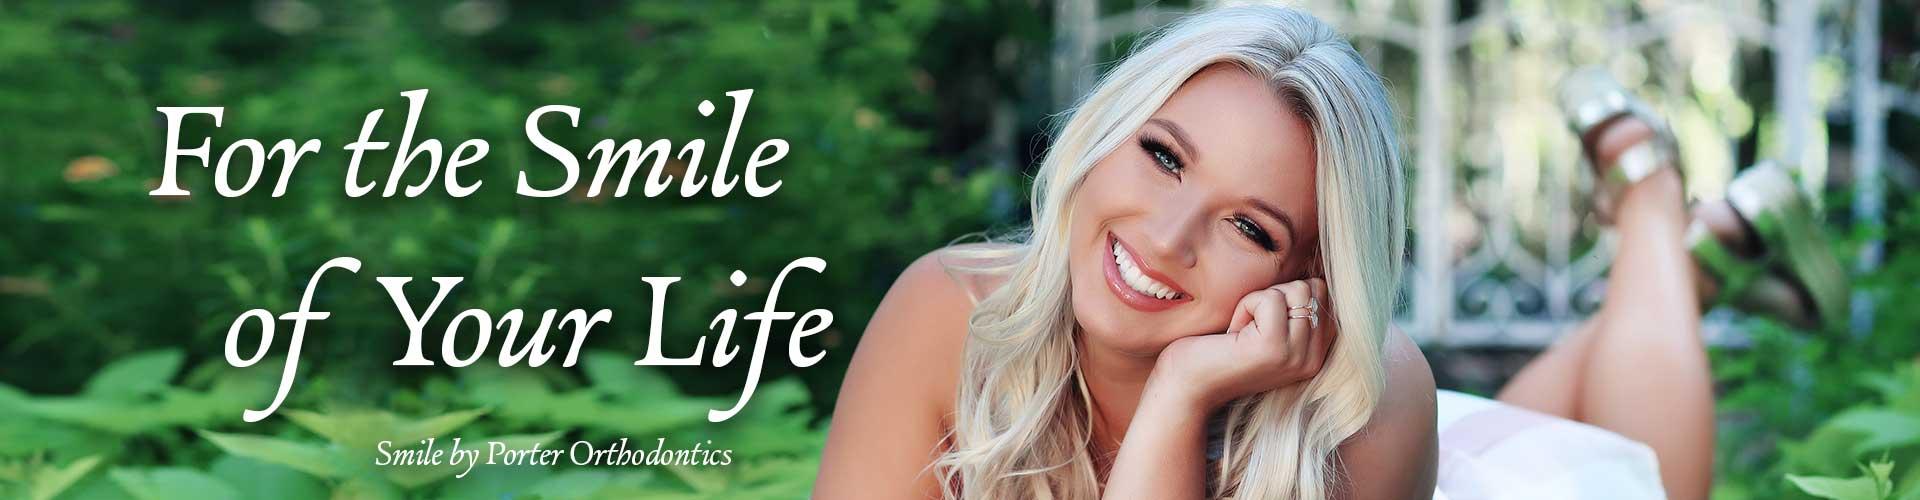 Smile of your life Porter Orthodontics Baton Rouge LA